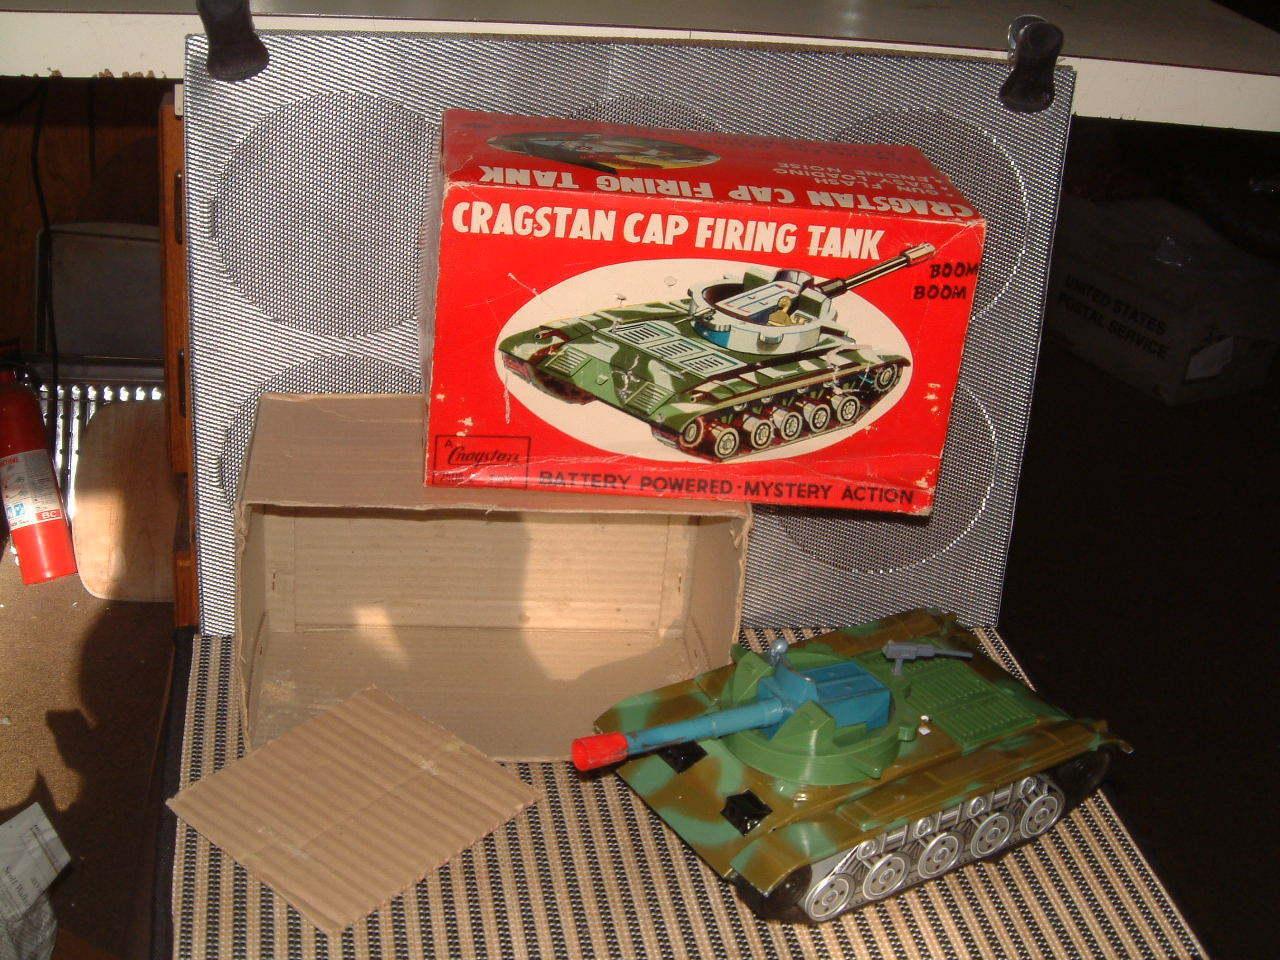 CRAGSTAN CRAGSTAN CRAGSTAN VINTAGE, TIN B O CAP FIRING TANK  COMPLETE W BOX  FULLY OPERATIONAL  d9f08f